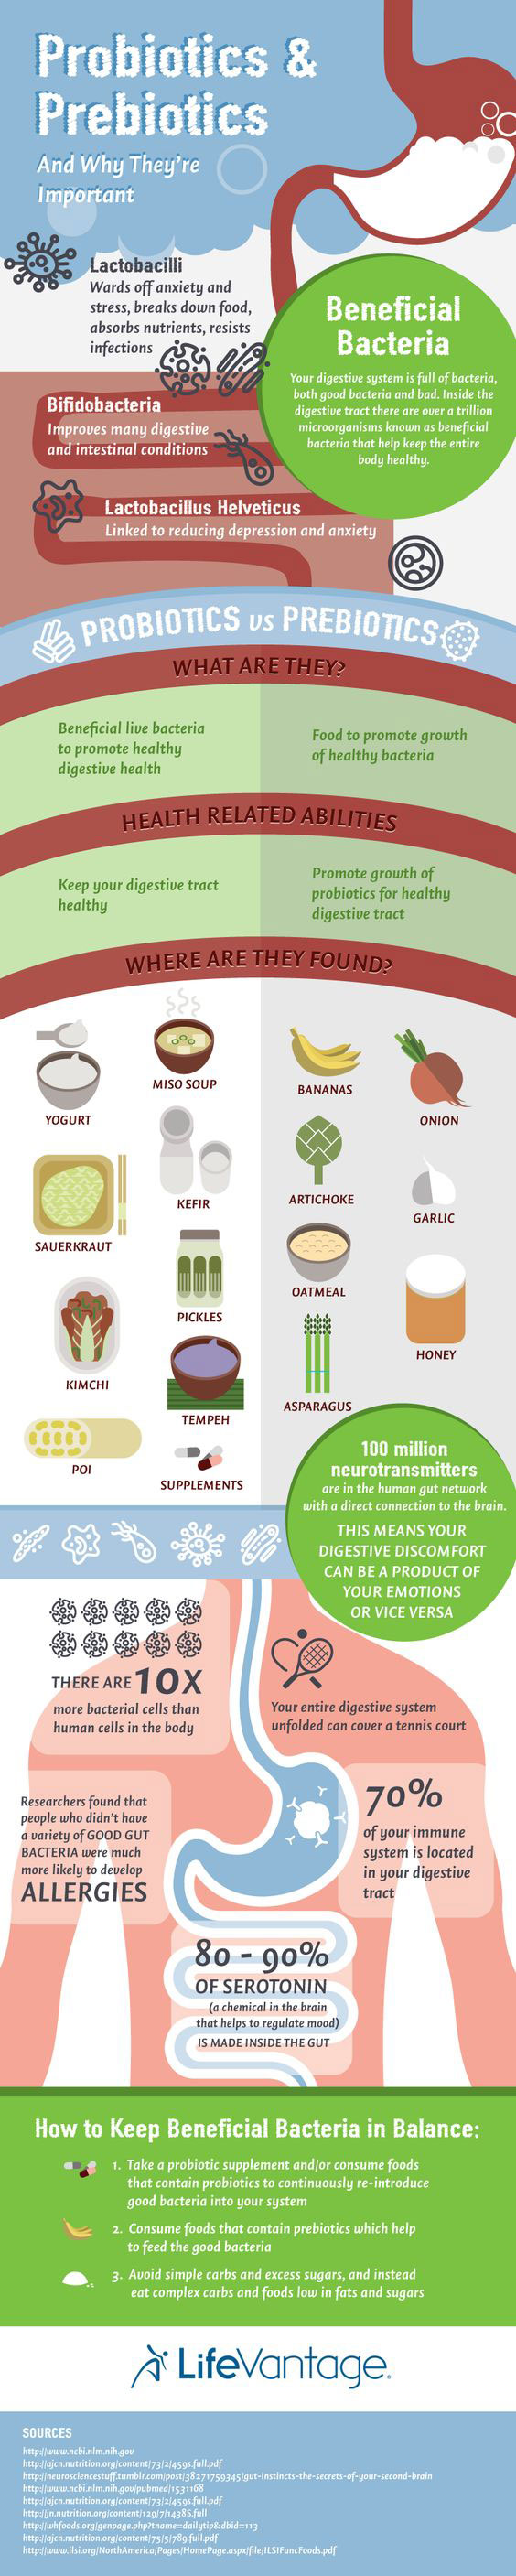 probiotics-prebiotics-infographic